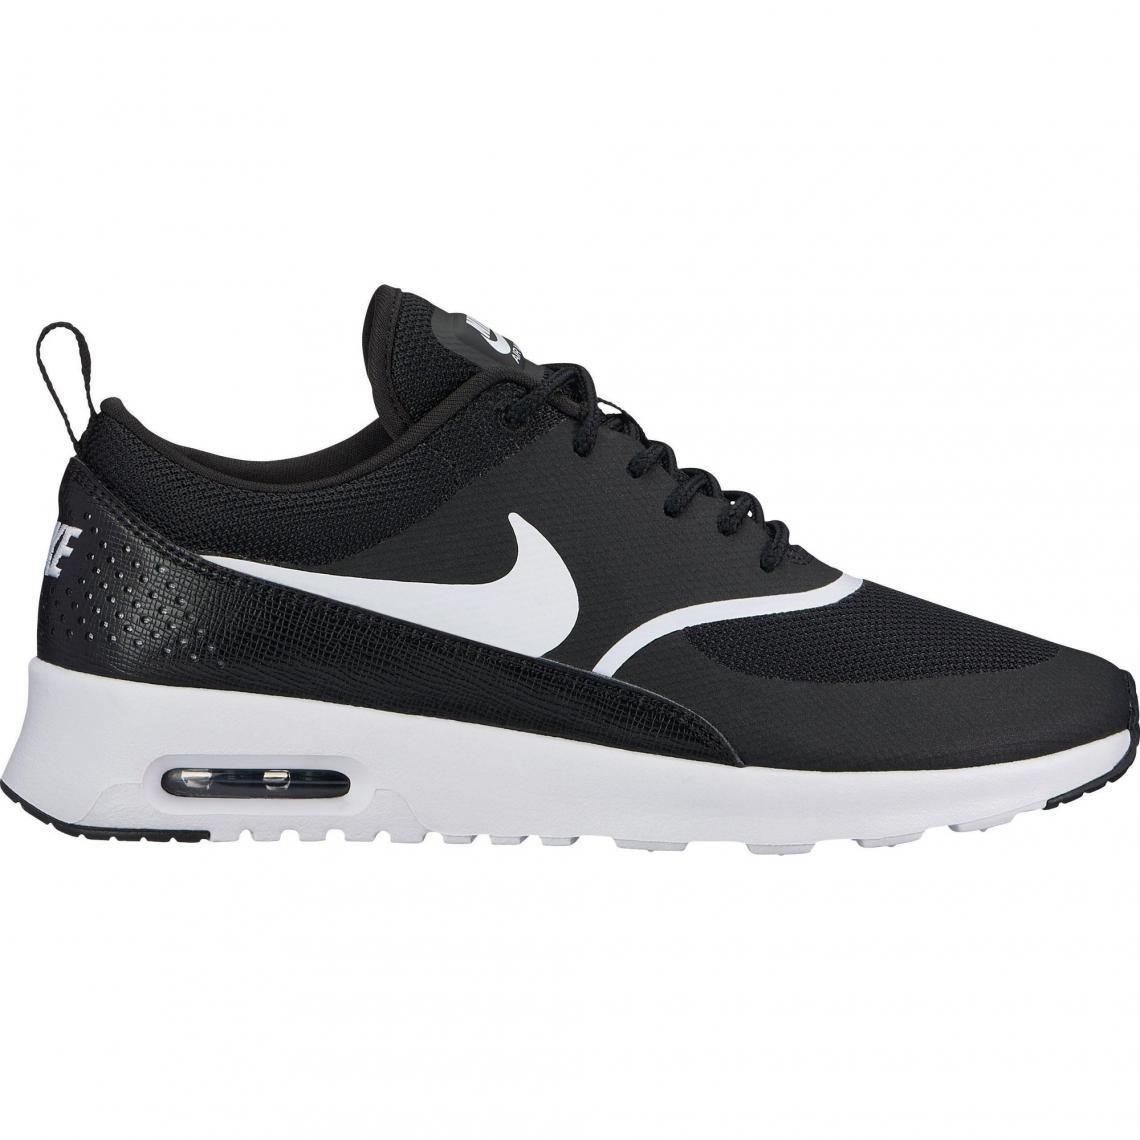 detailed look 17d74 28ec2 Nike Air Max Thea chaussures de running homme - Noir Nike Homme